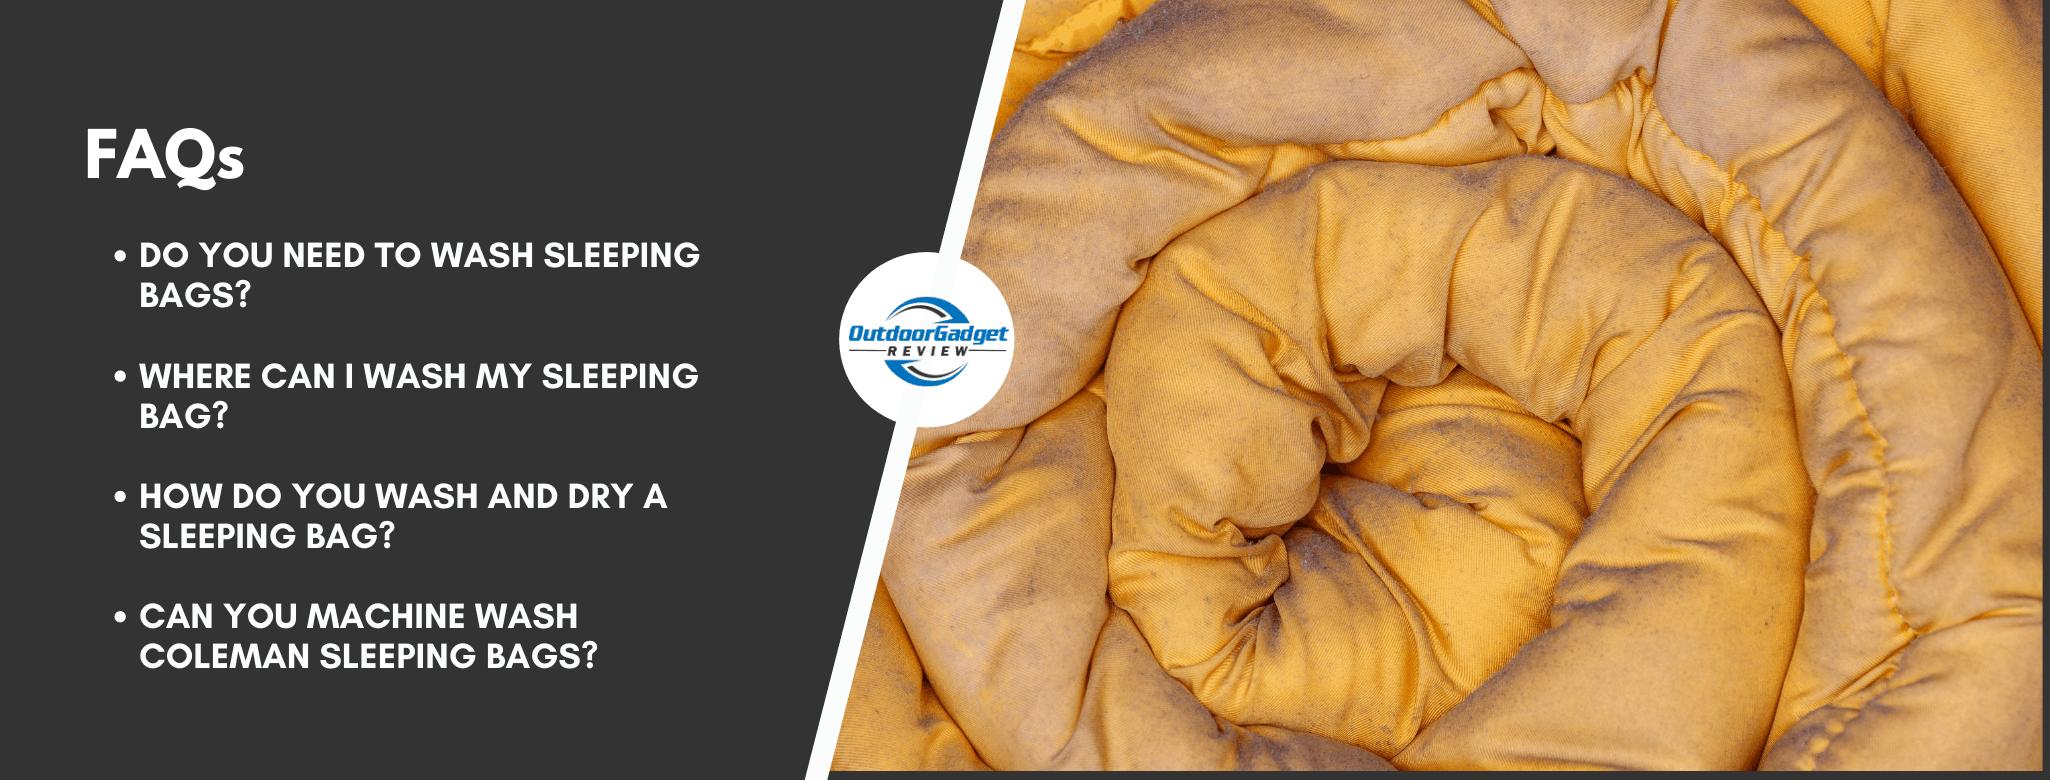 Washing a sleeping bag FAQs